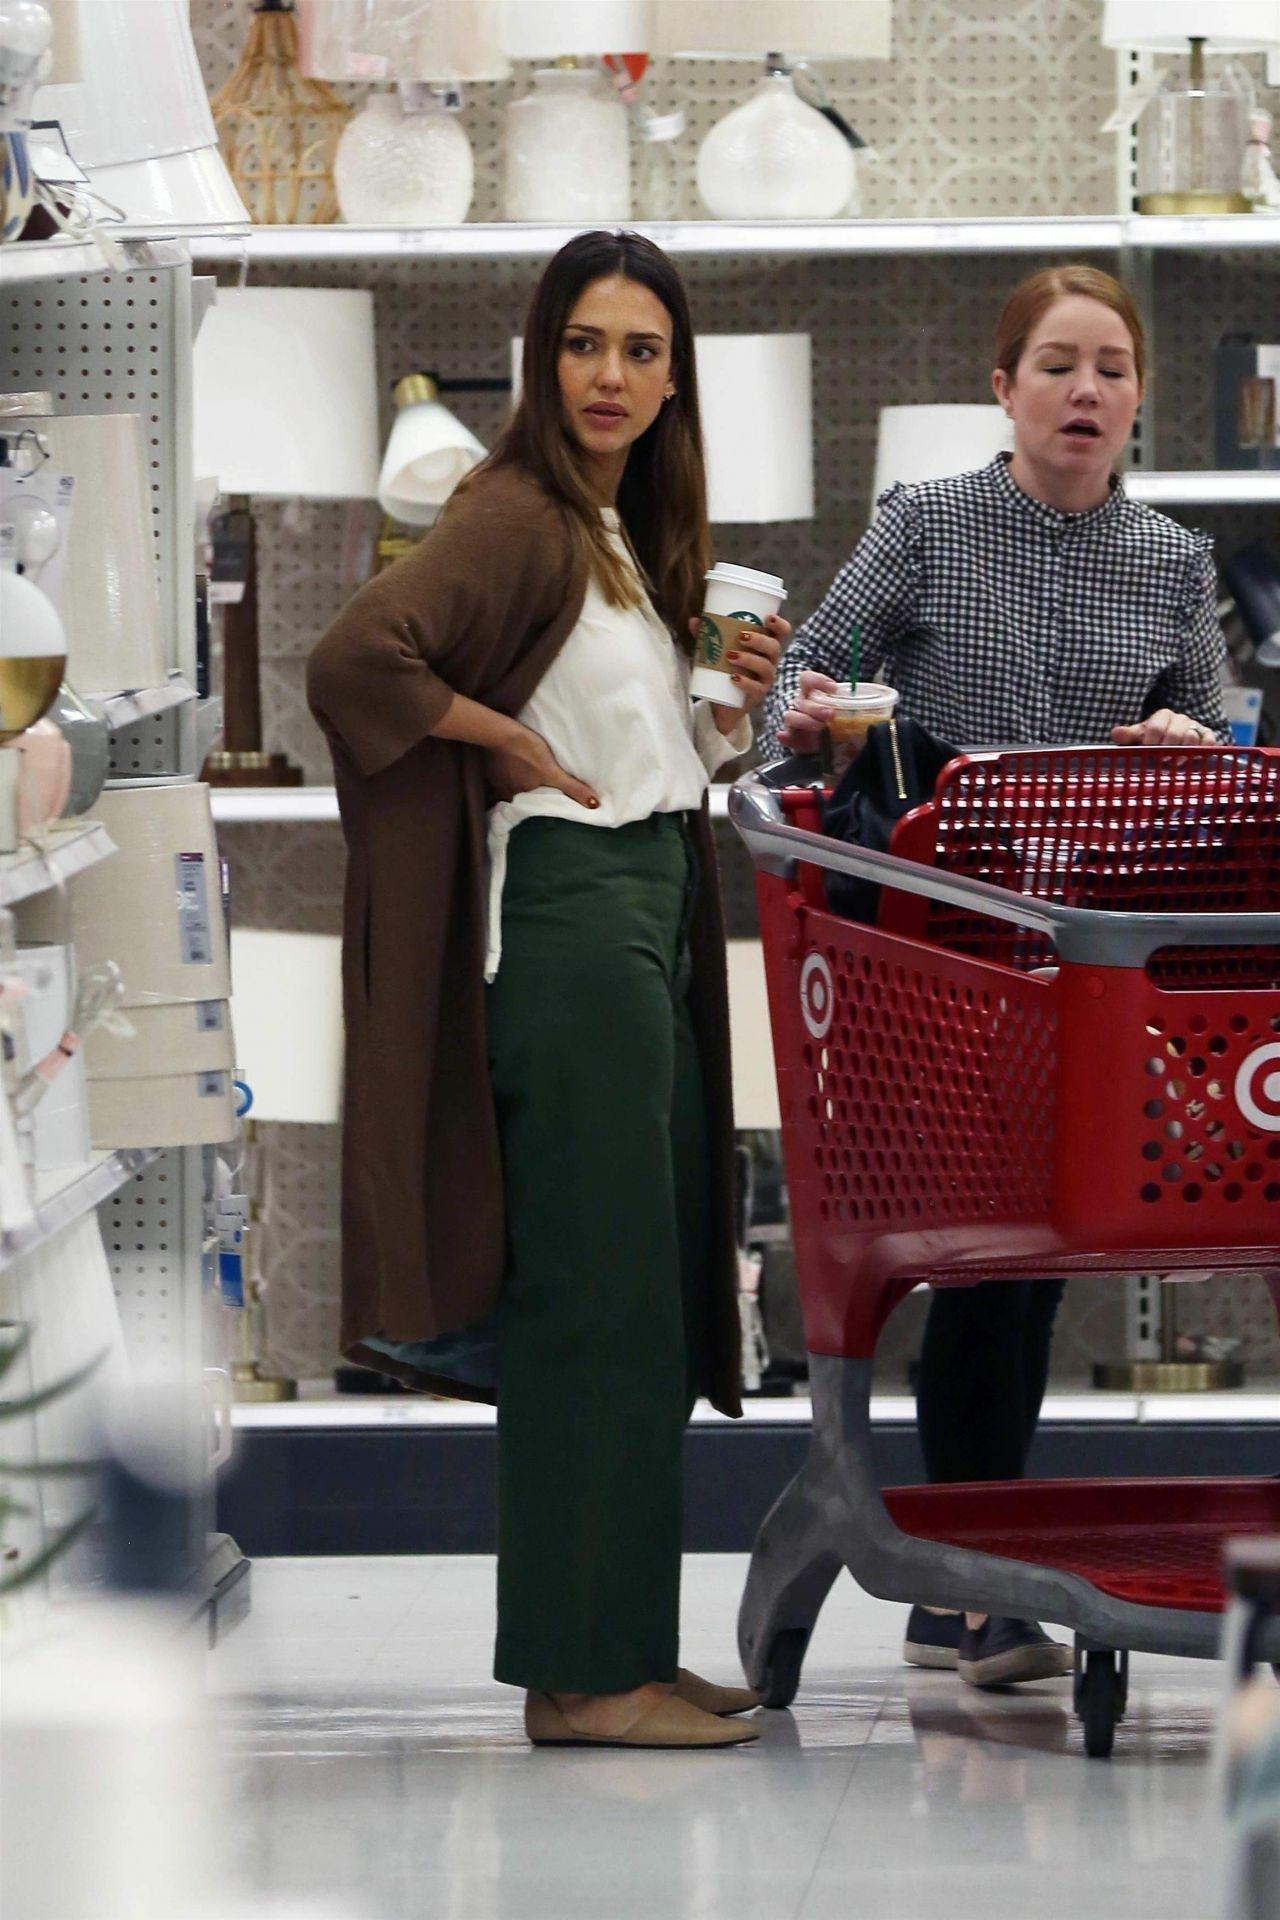 https://celebmafia.com/wp-content/uploads/2018/11/jessica-alba-shopping-at-target-store-in-los-angeles-11-21-2018-4.jpg